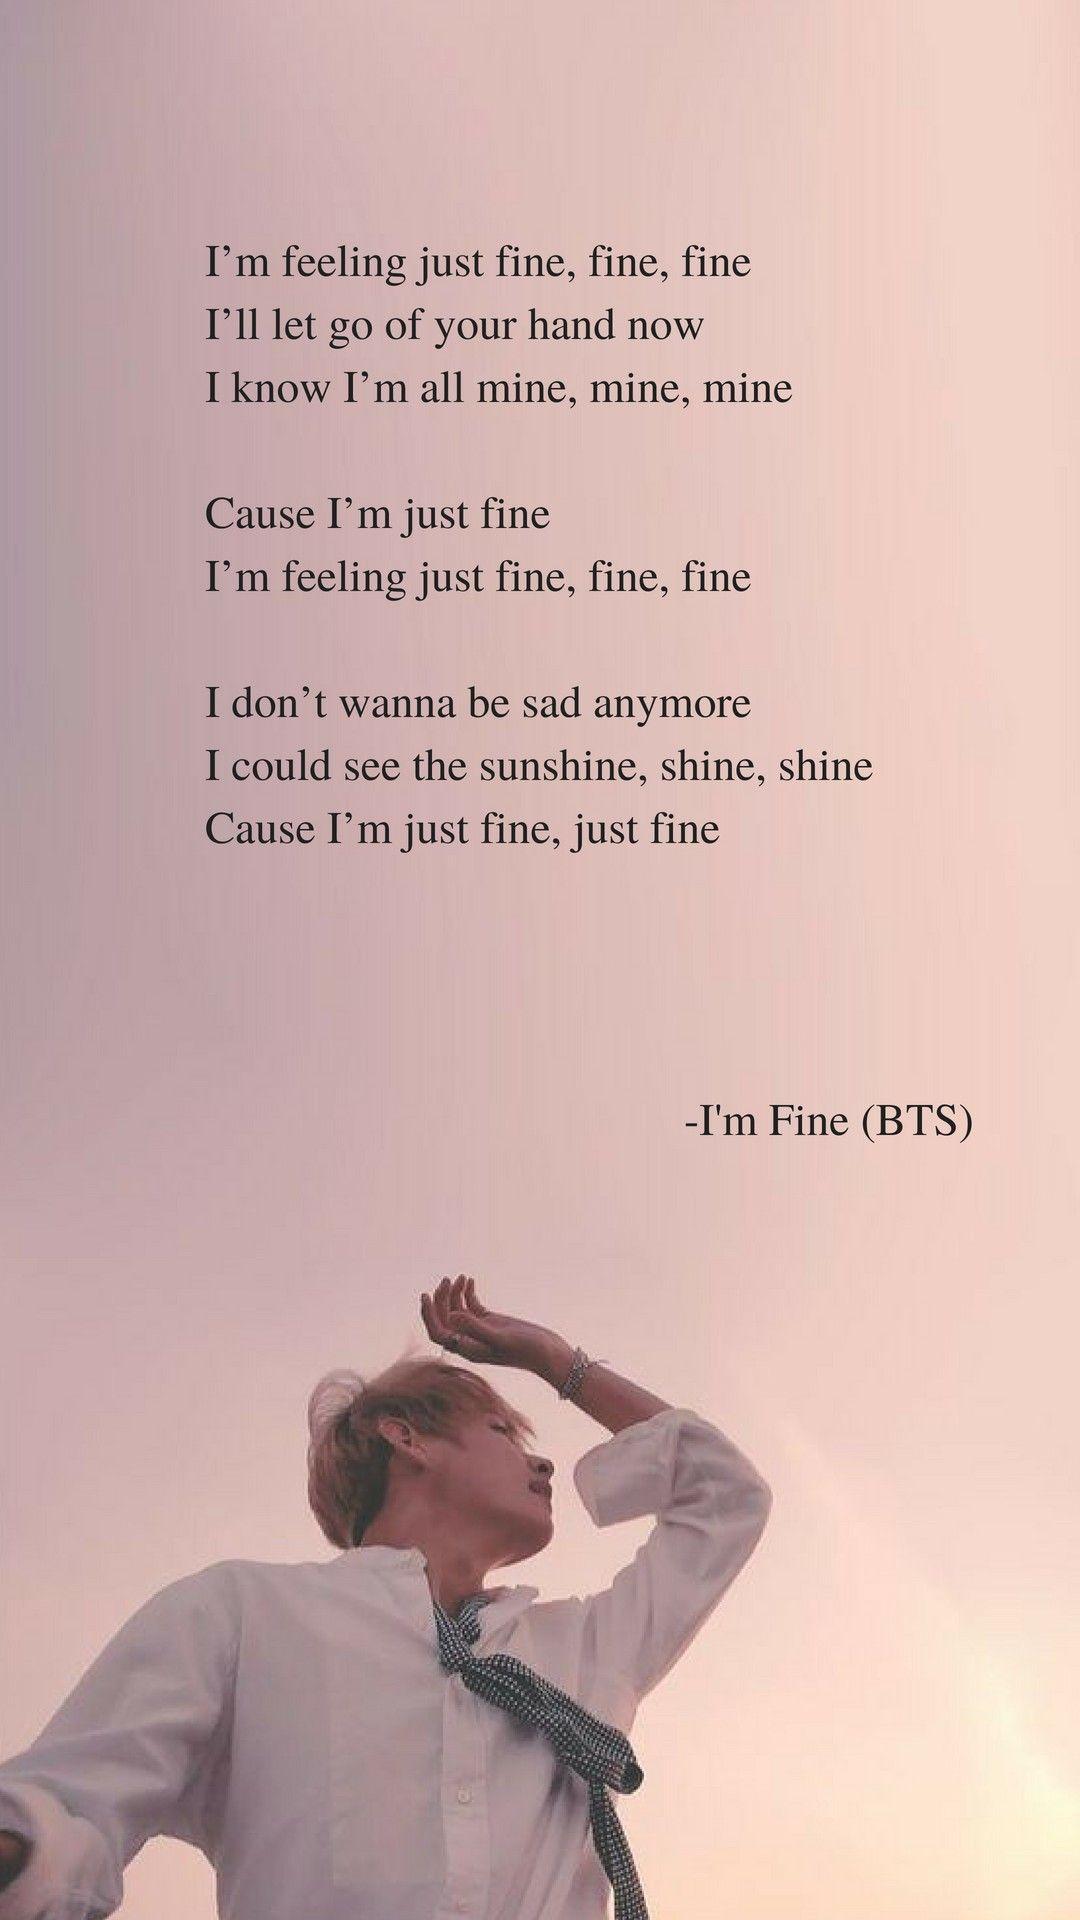 I'm Fine by BTS Lyrics wallpaper